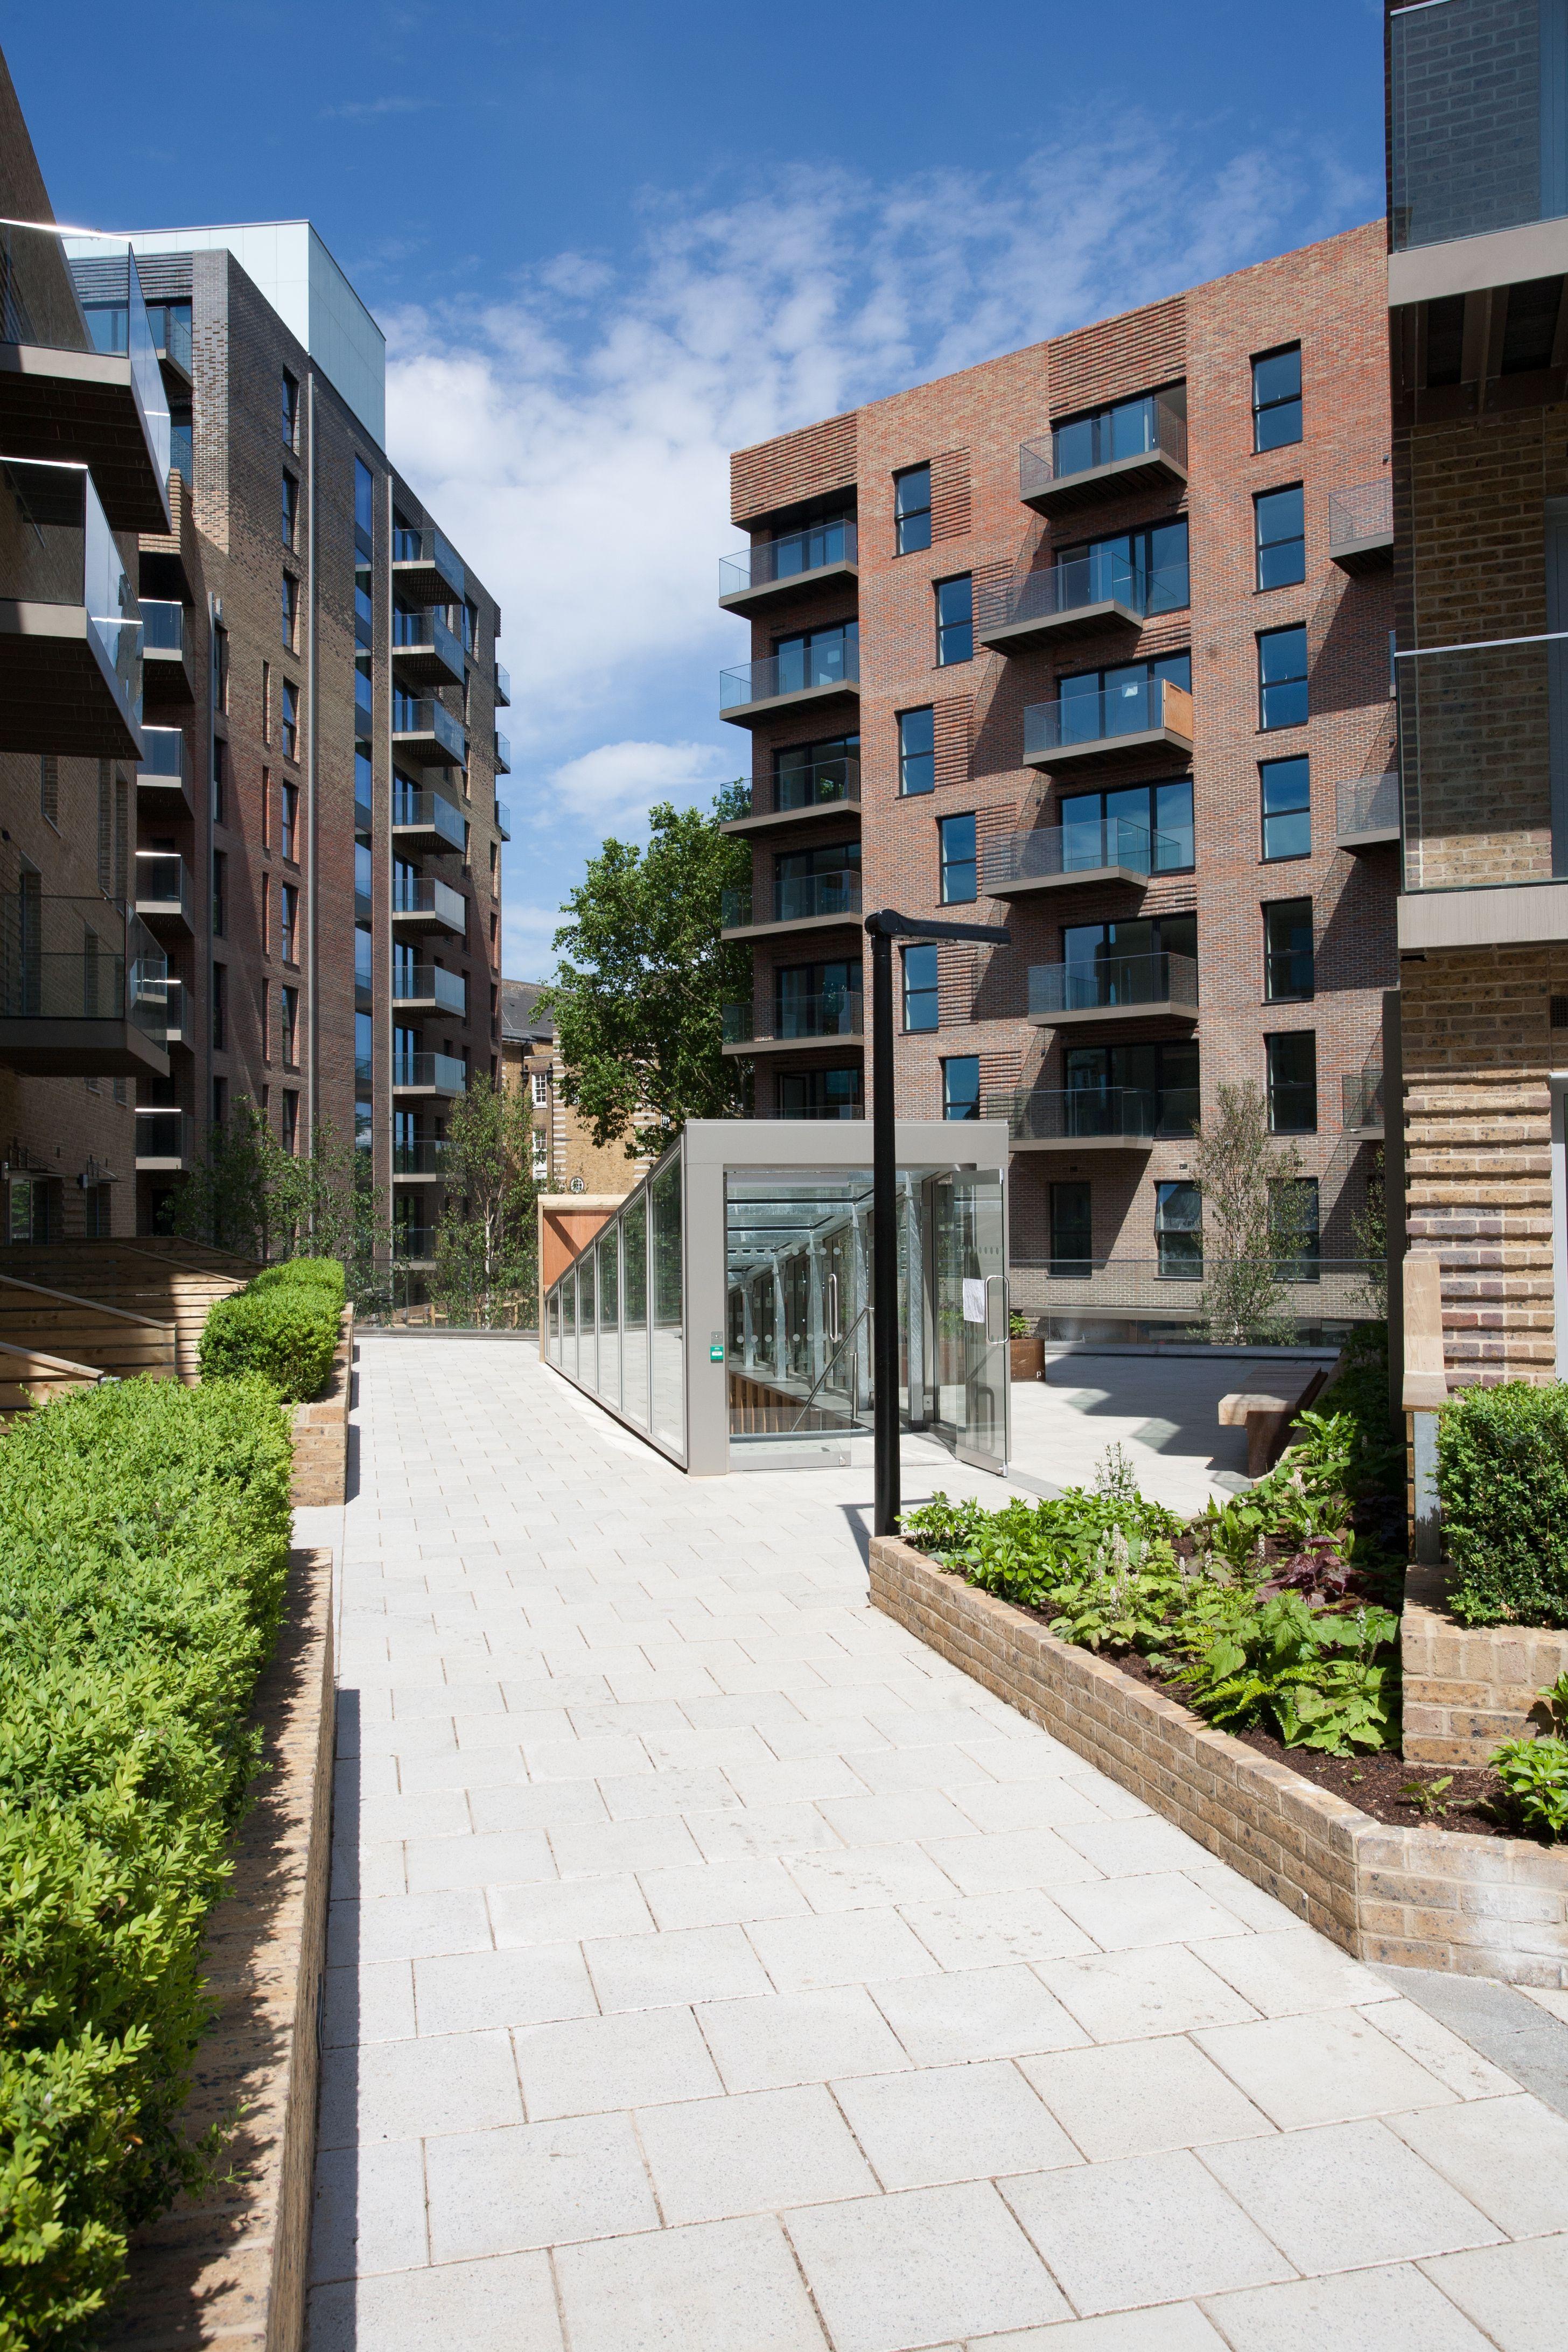 Michelmersh | Brickwork, Architects and Architecture